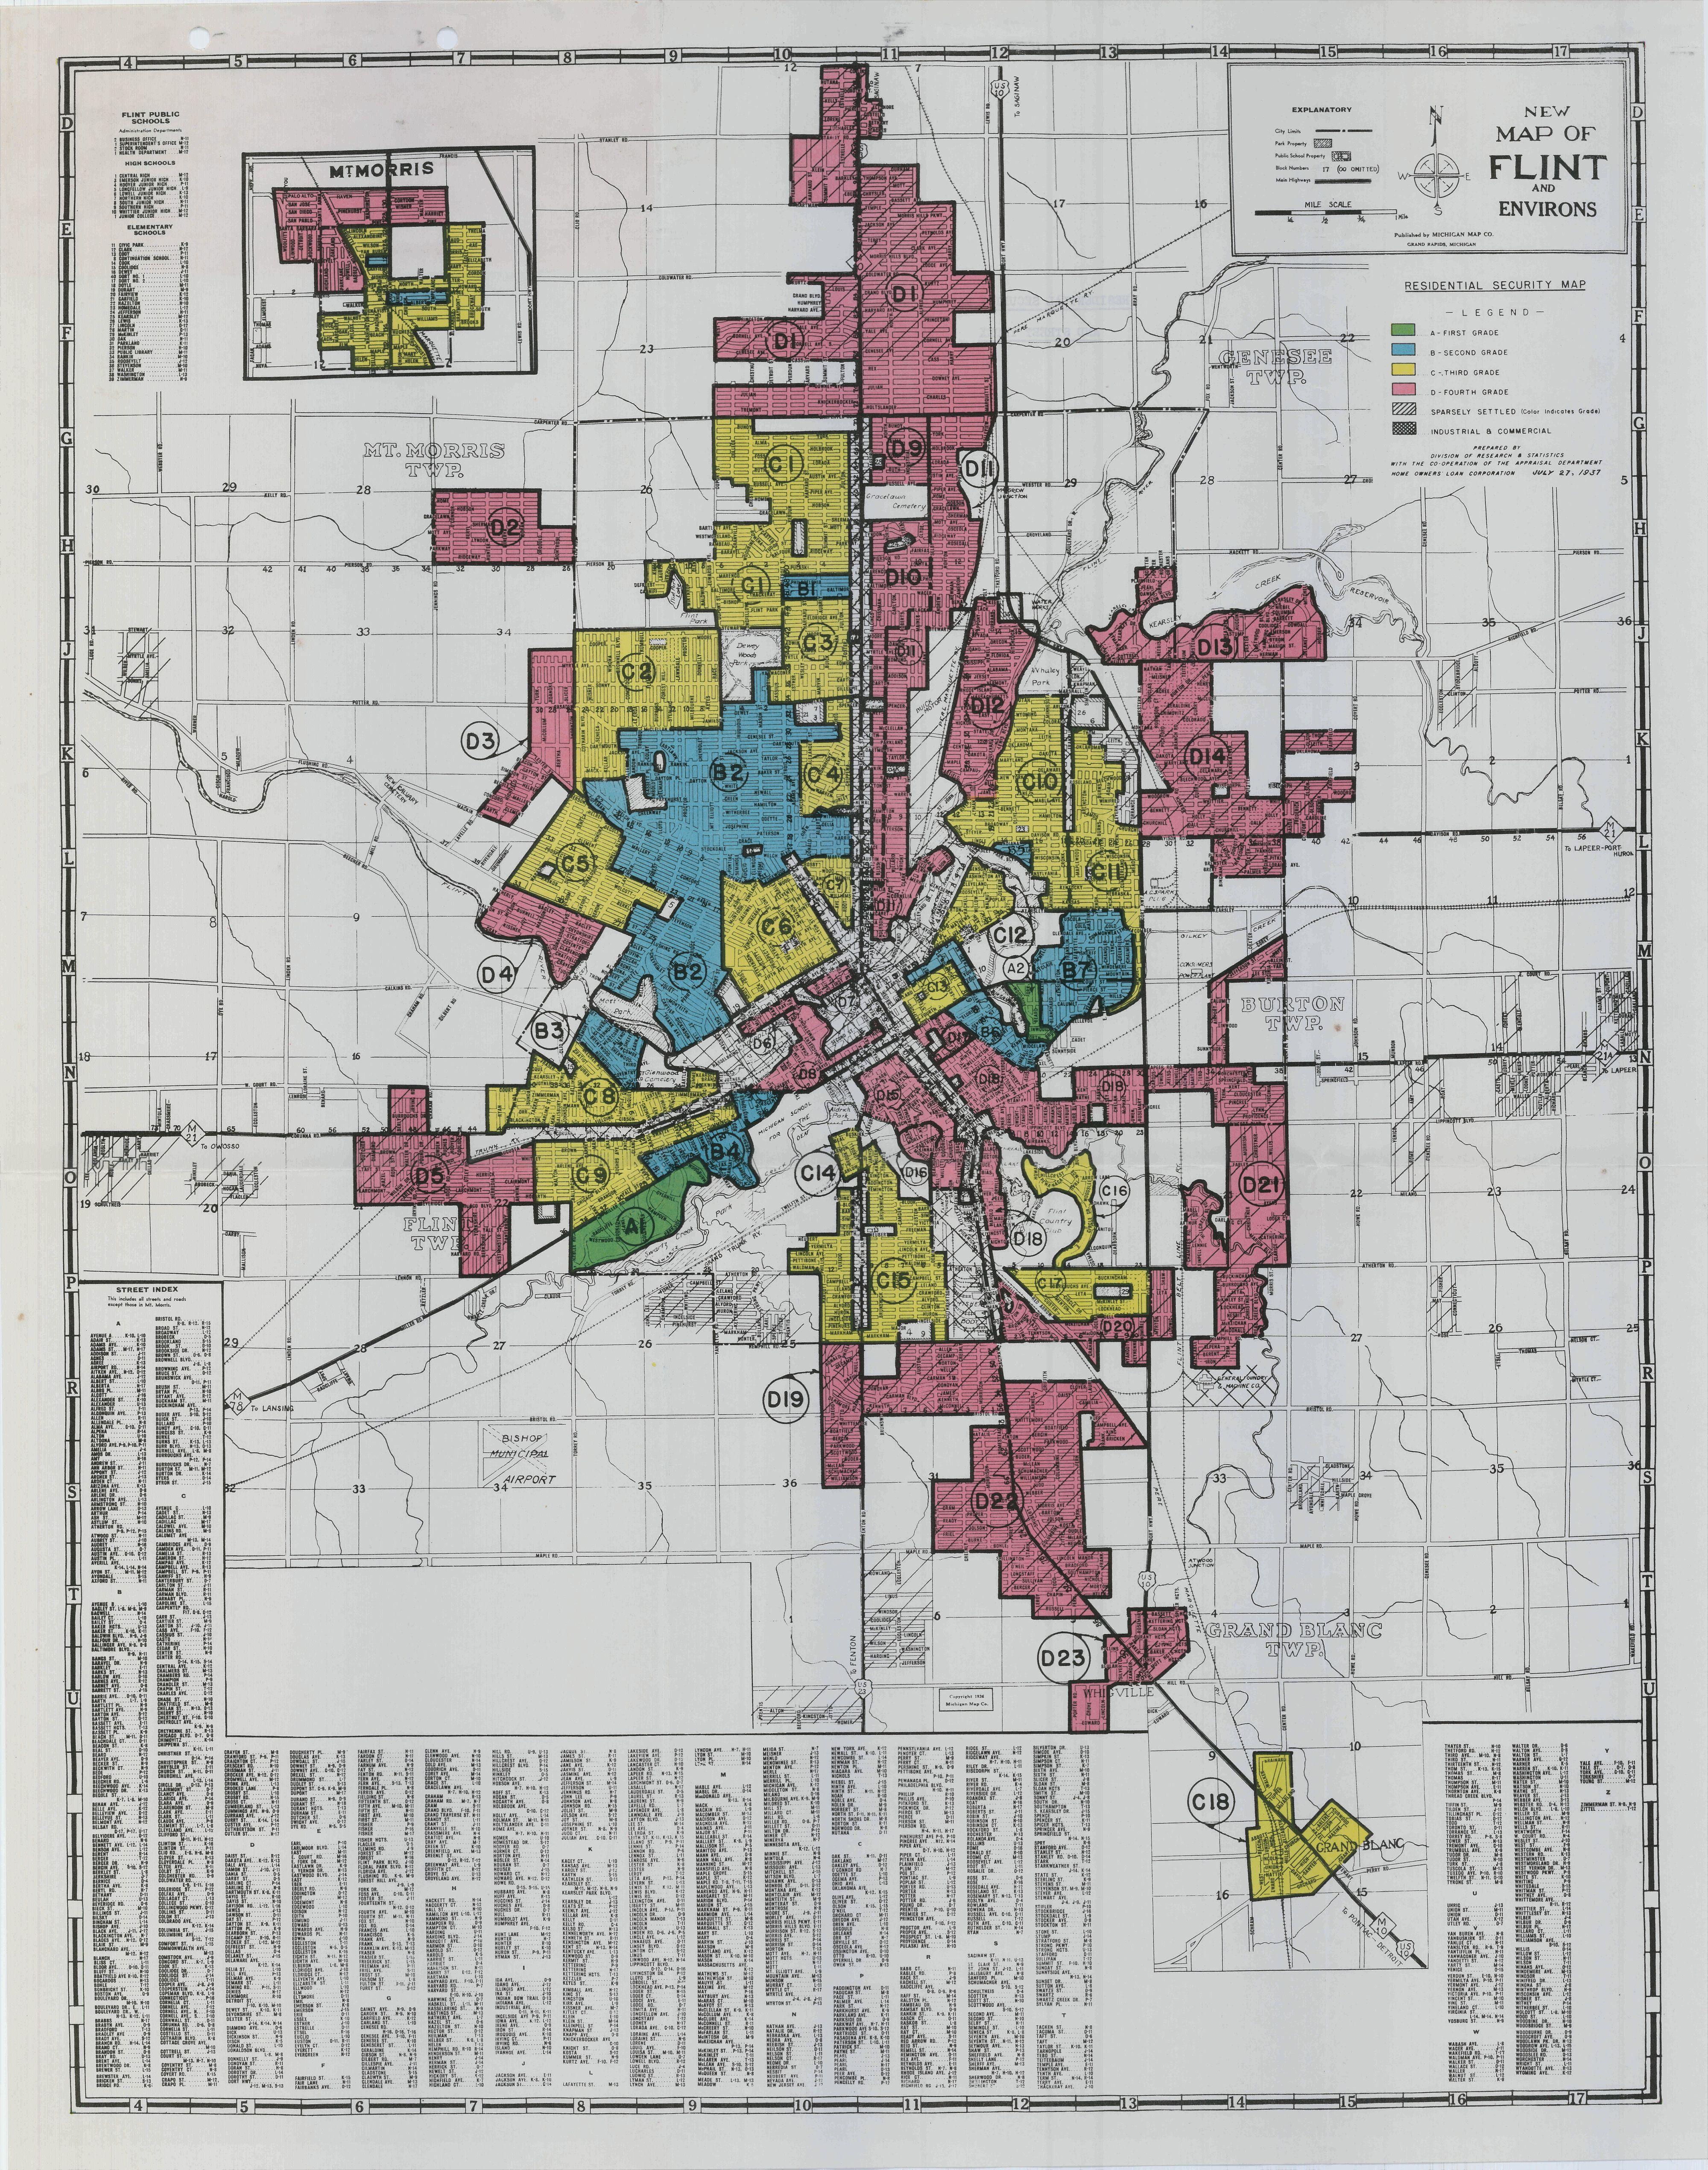 Flint Housing Redline Map 1937 Flint Michigan Flint Michigan